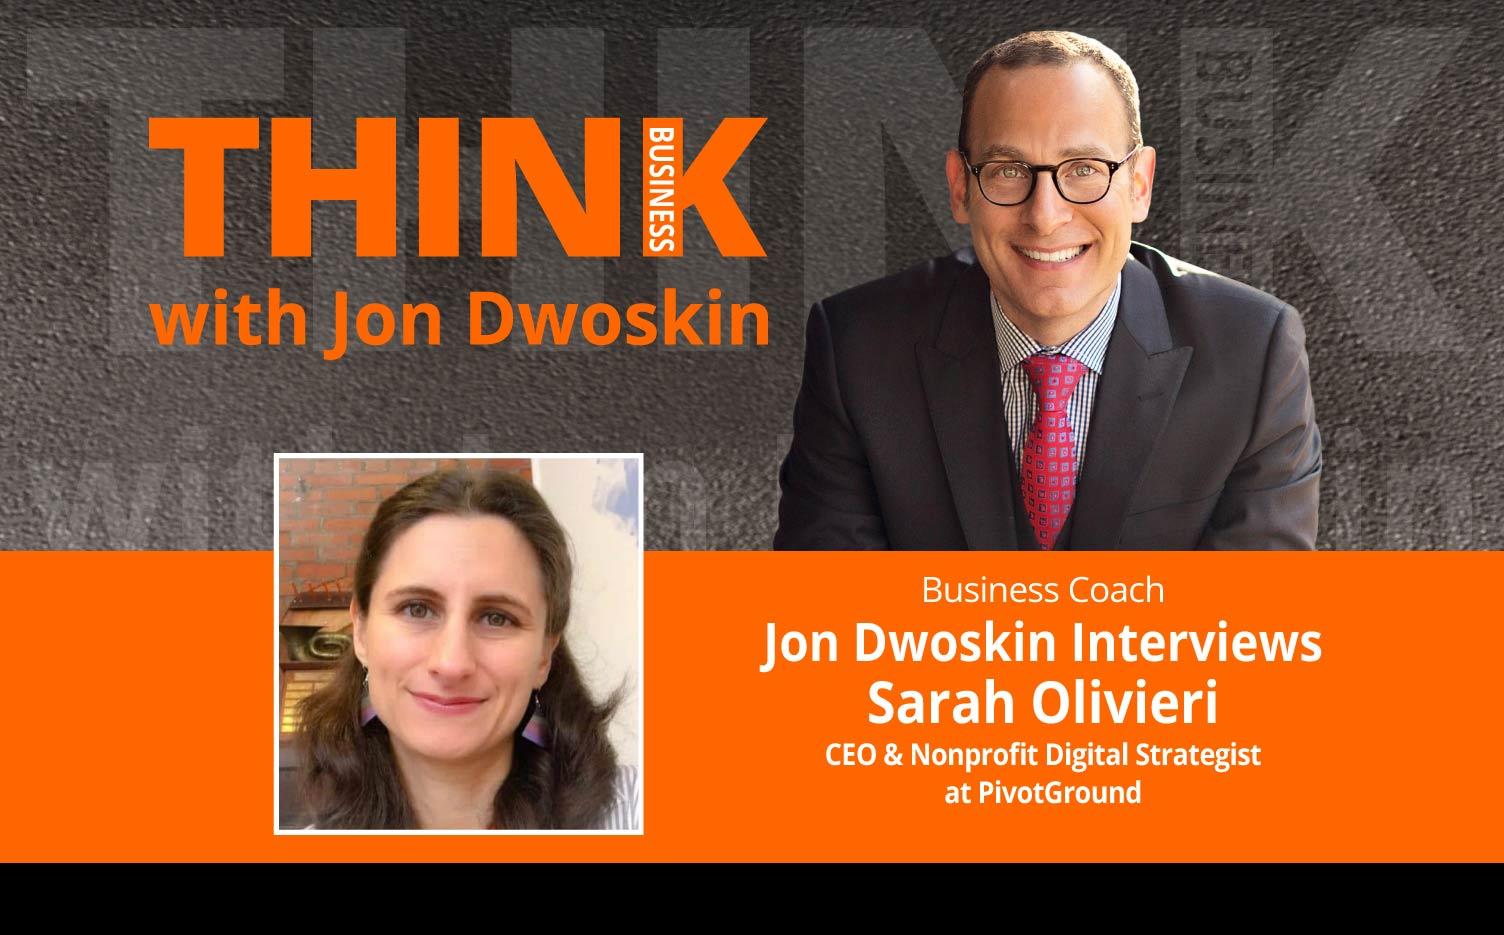 THINK Business Podcast: Jon Dwoskin Interviews Sarah Olivieri, CEO & Nonprofit Digital Strategist at PivotGround